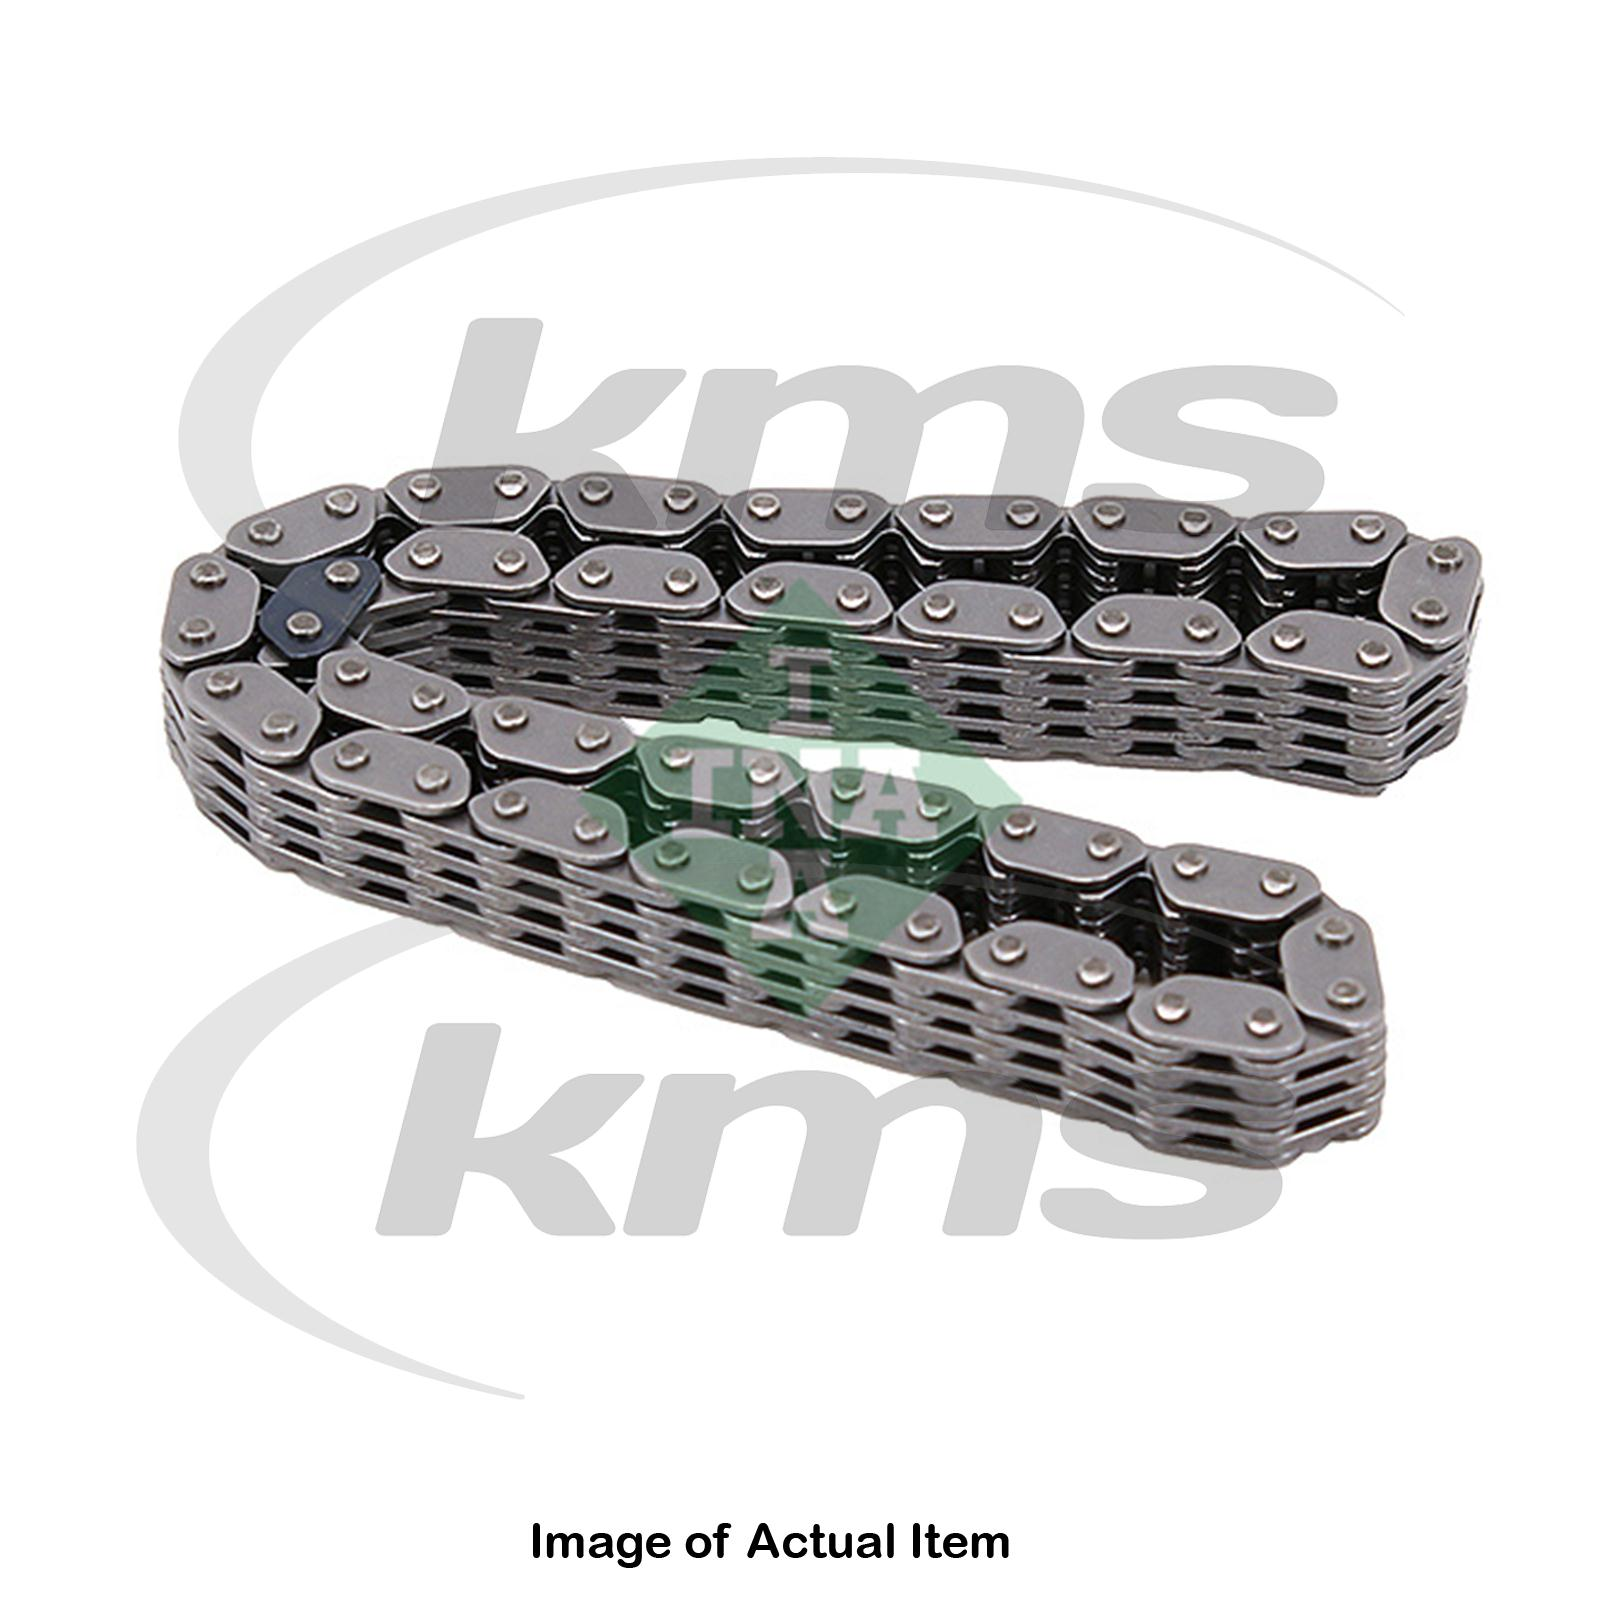 New Genuine INA Oil Pump Drive Chain 553 0388 10 Top German Quality | eBay